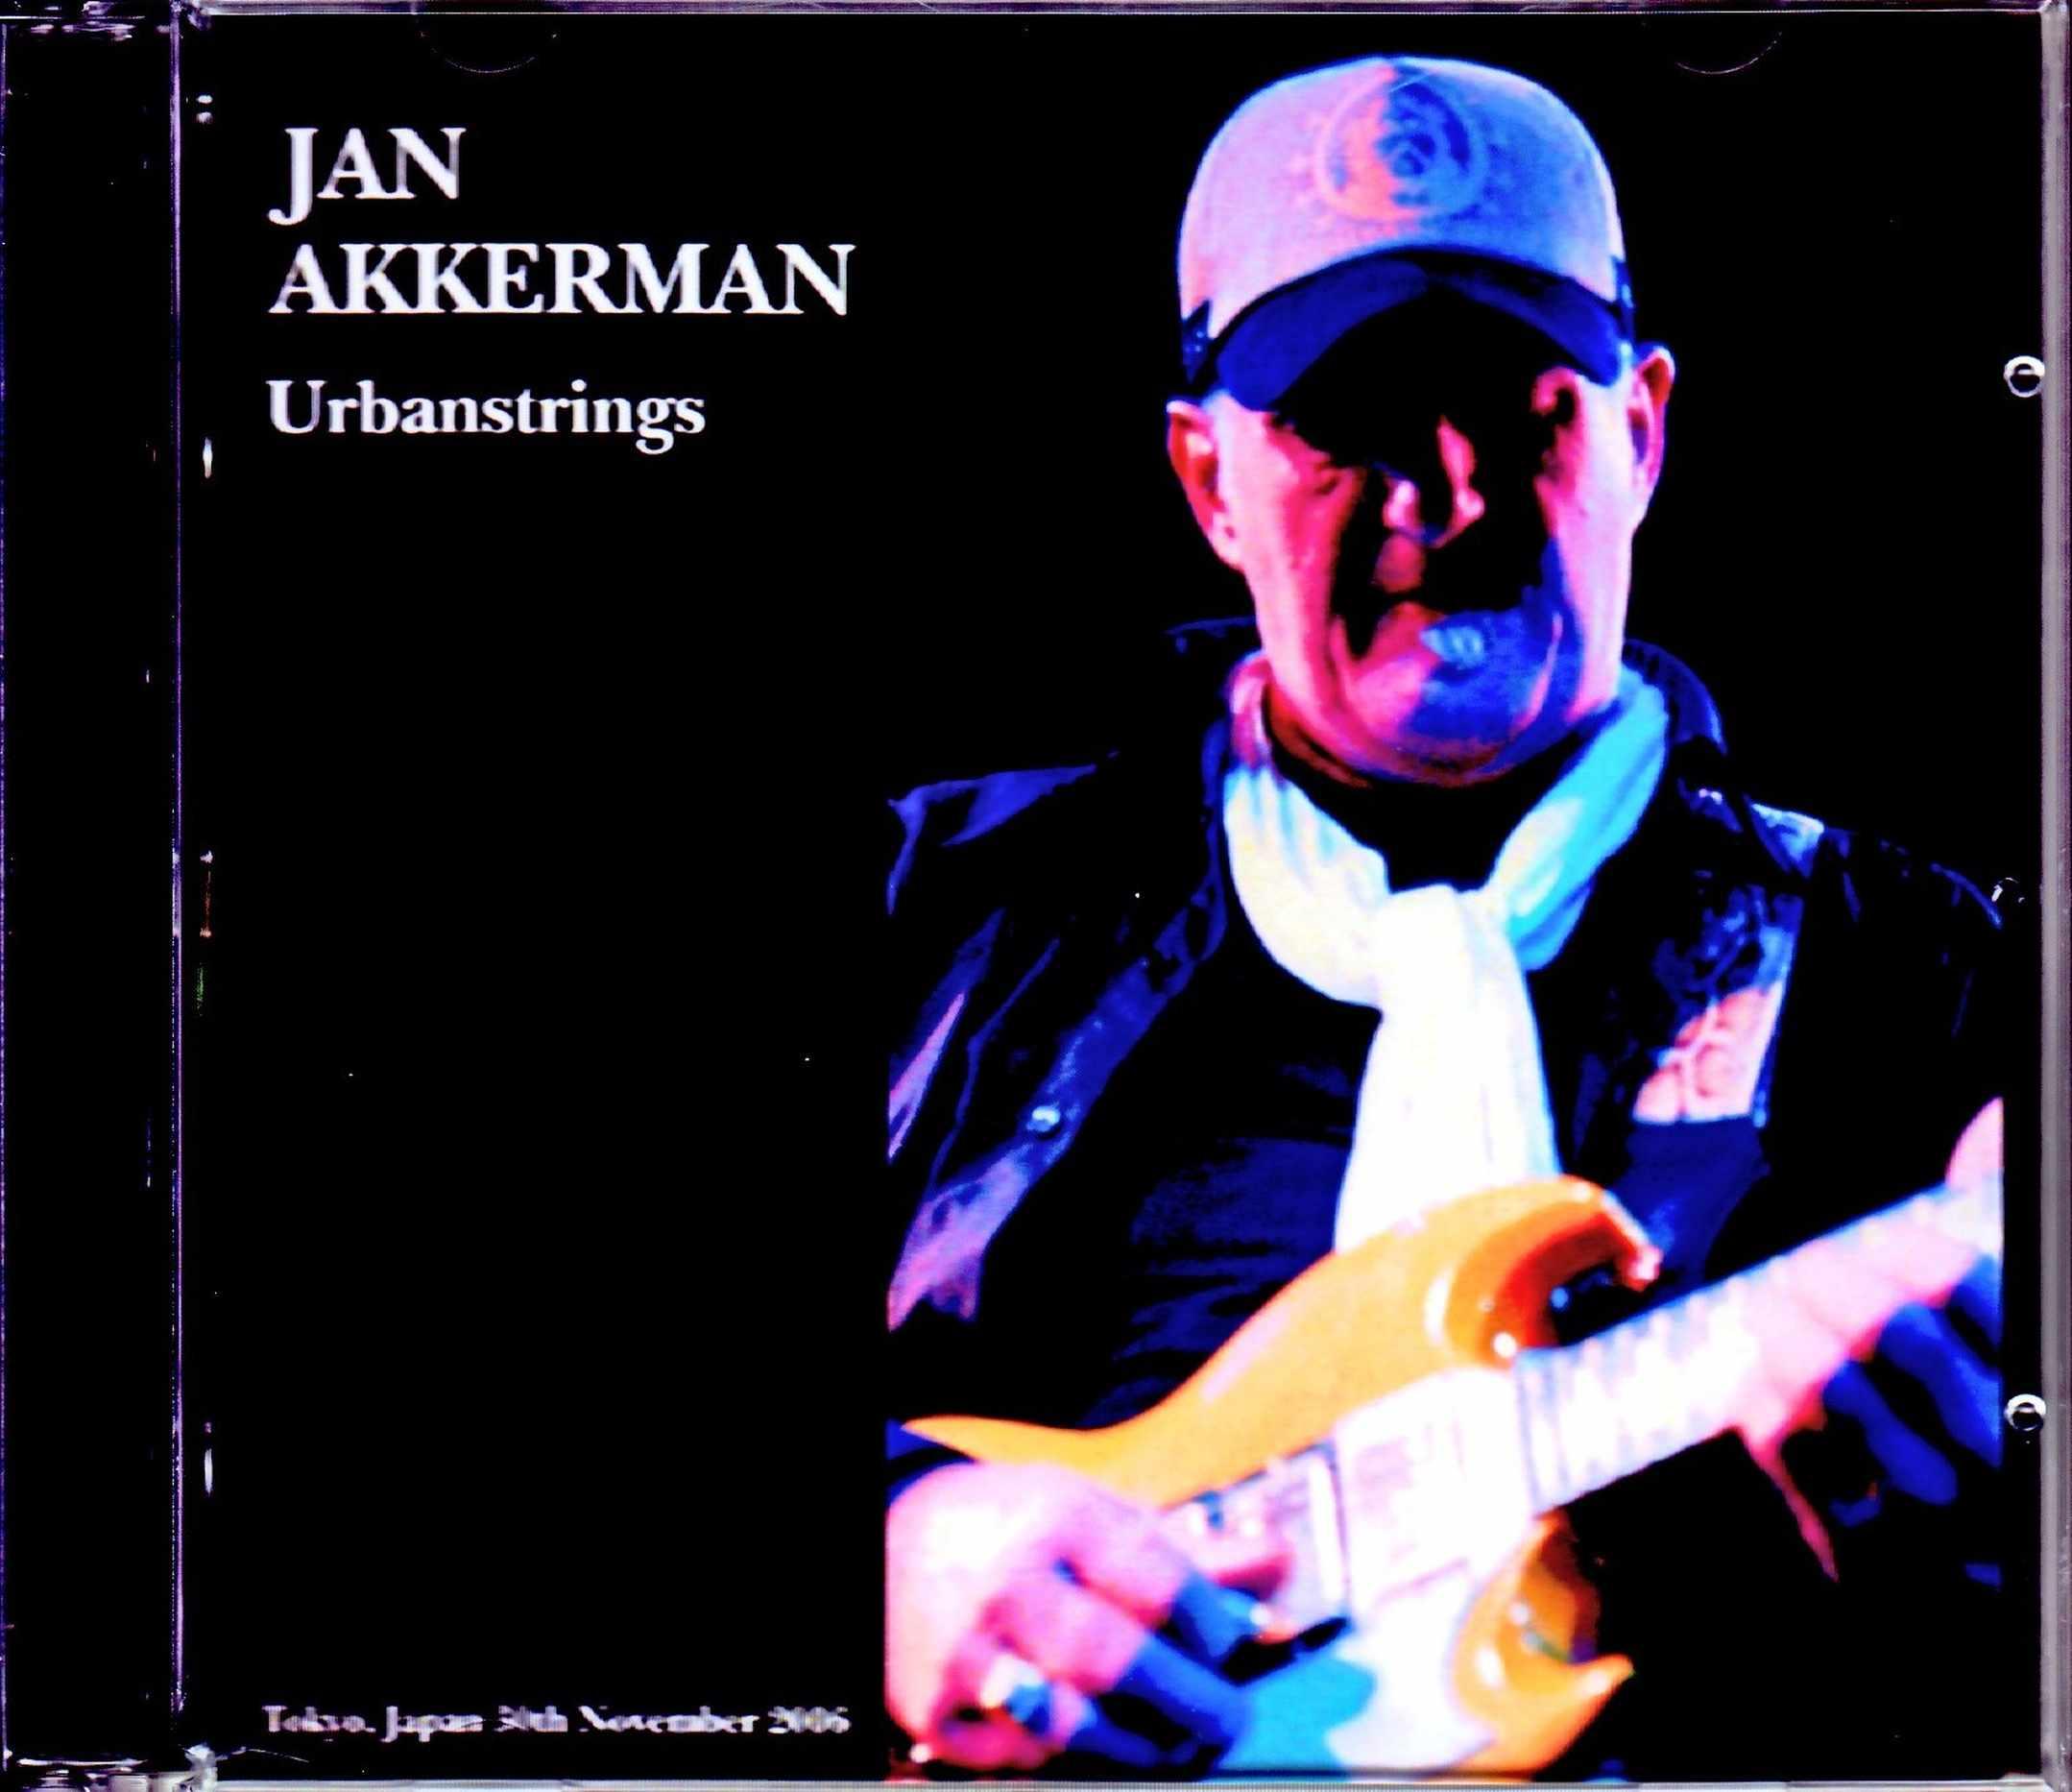 Jan Akkerman ヤン・アッカーマン/Tokyo,Japan 11.30.2006